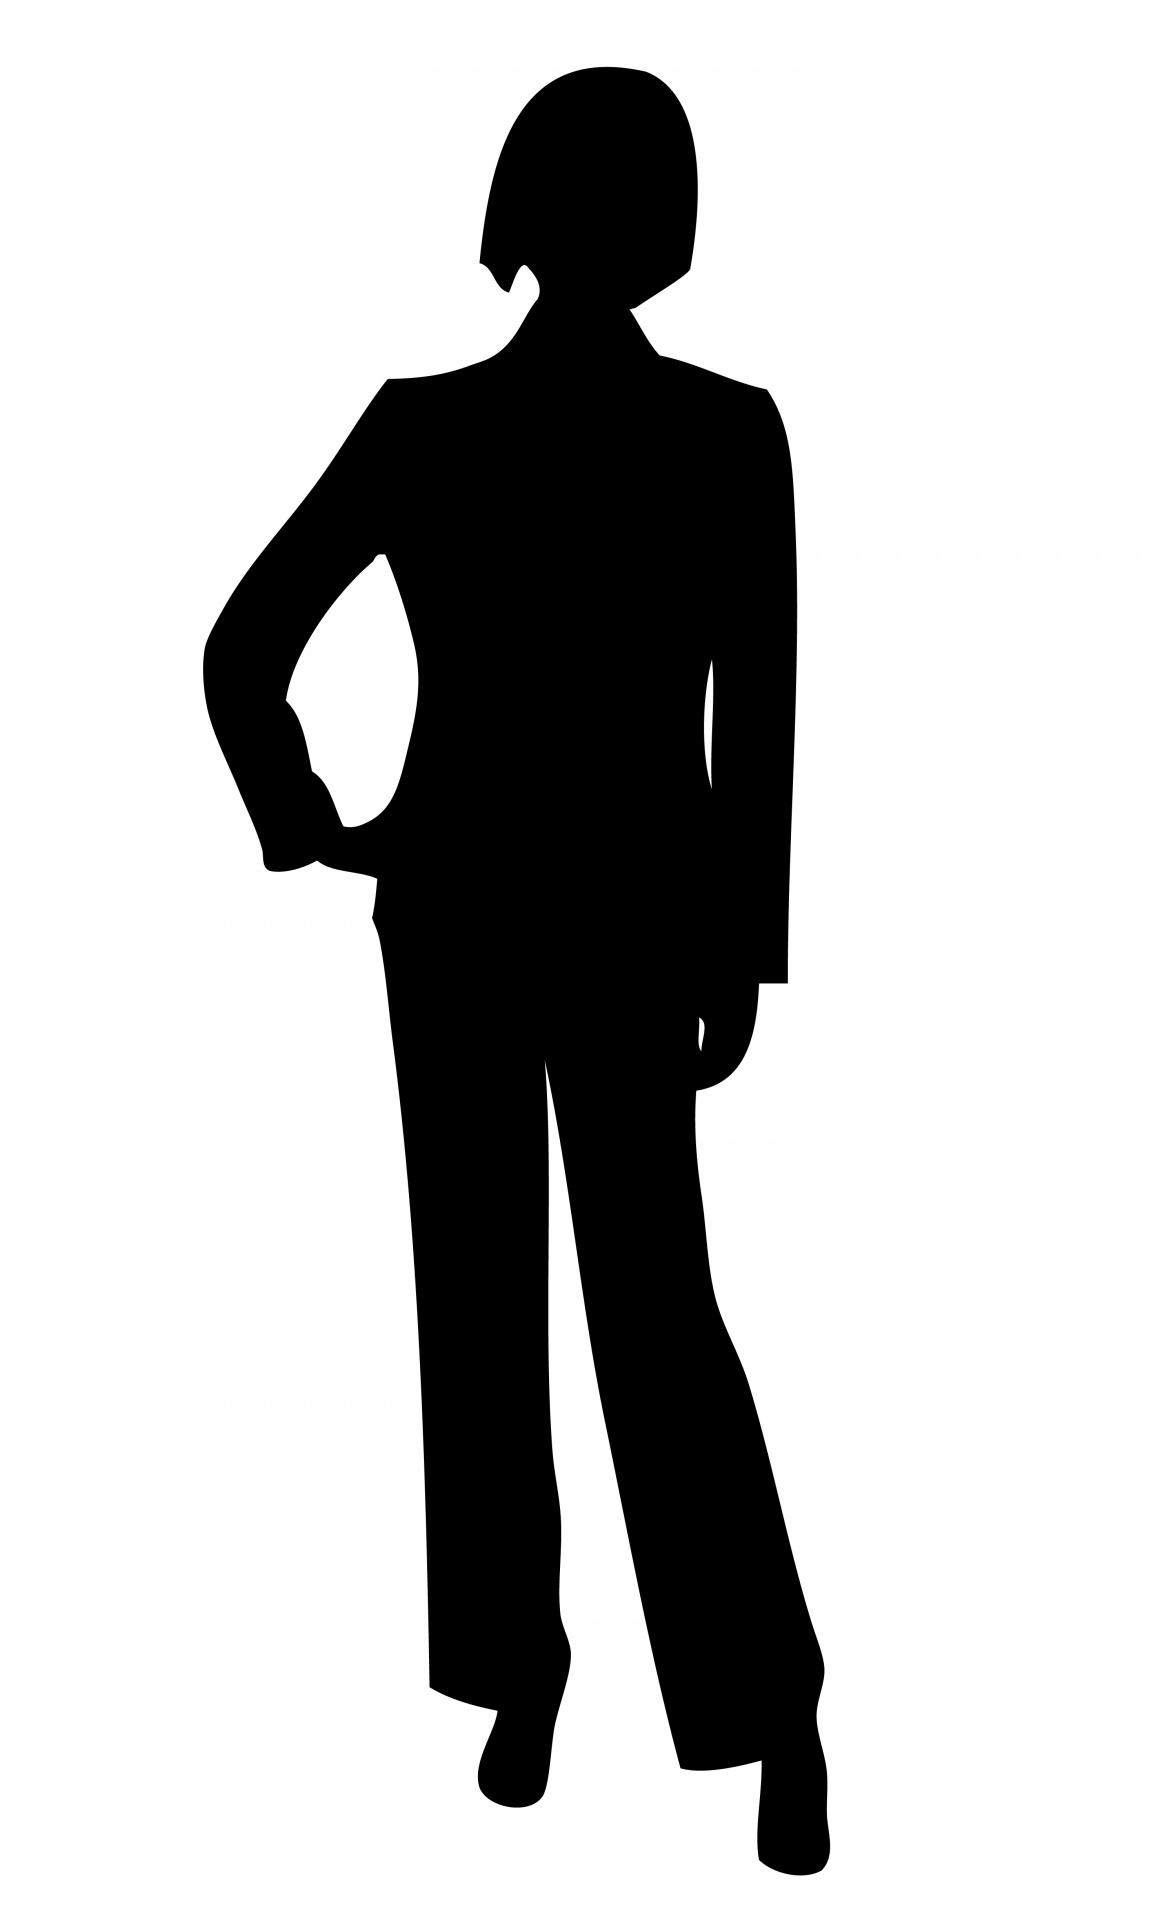 Business Woman Silhouette .-Business Woman Silhouette .-7